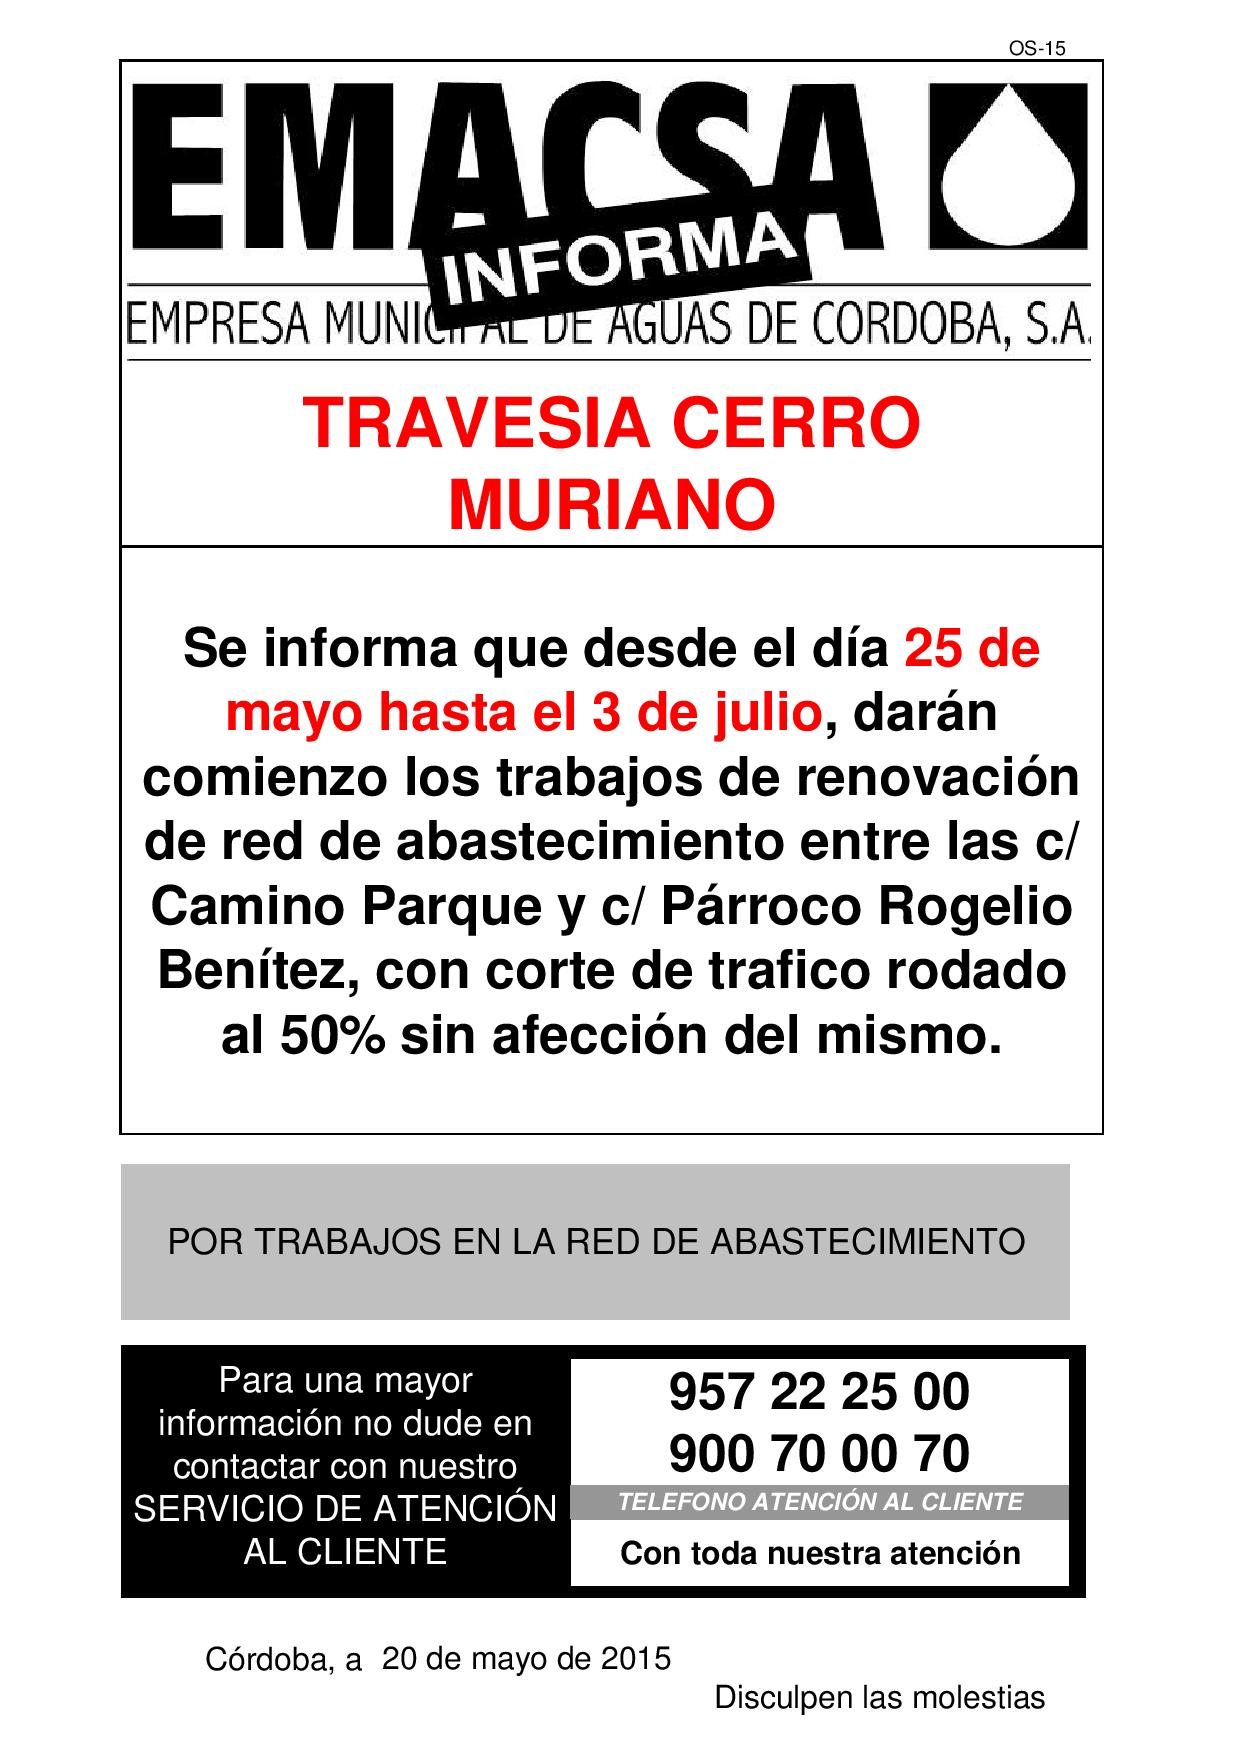 Travesia cerro muriano (25 mayo a 3 julio)